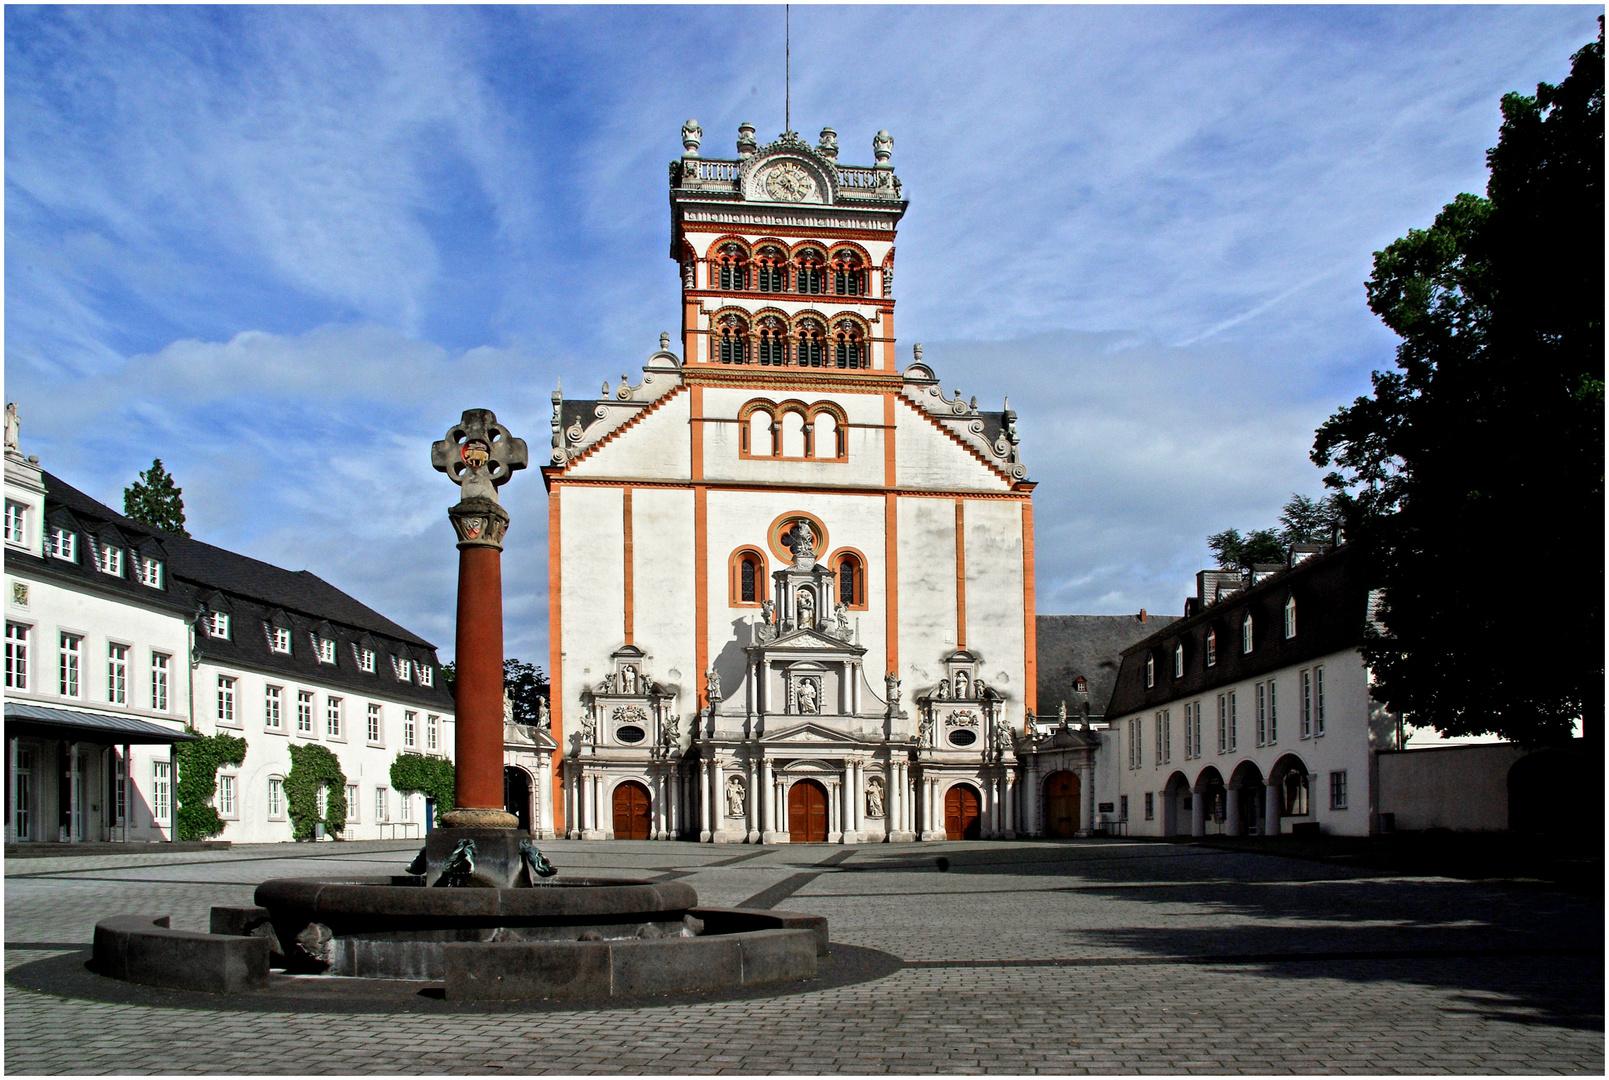 St. Matthiaskirche in Trier